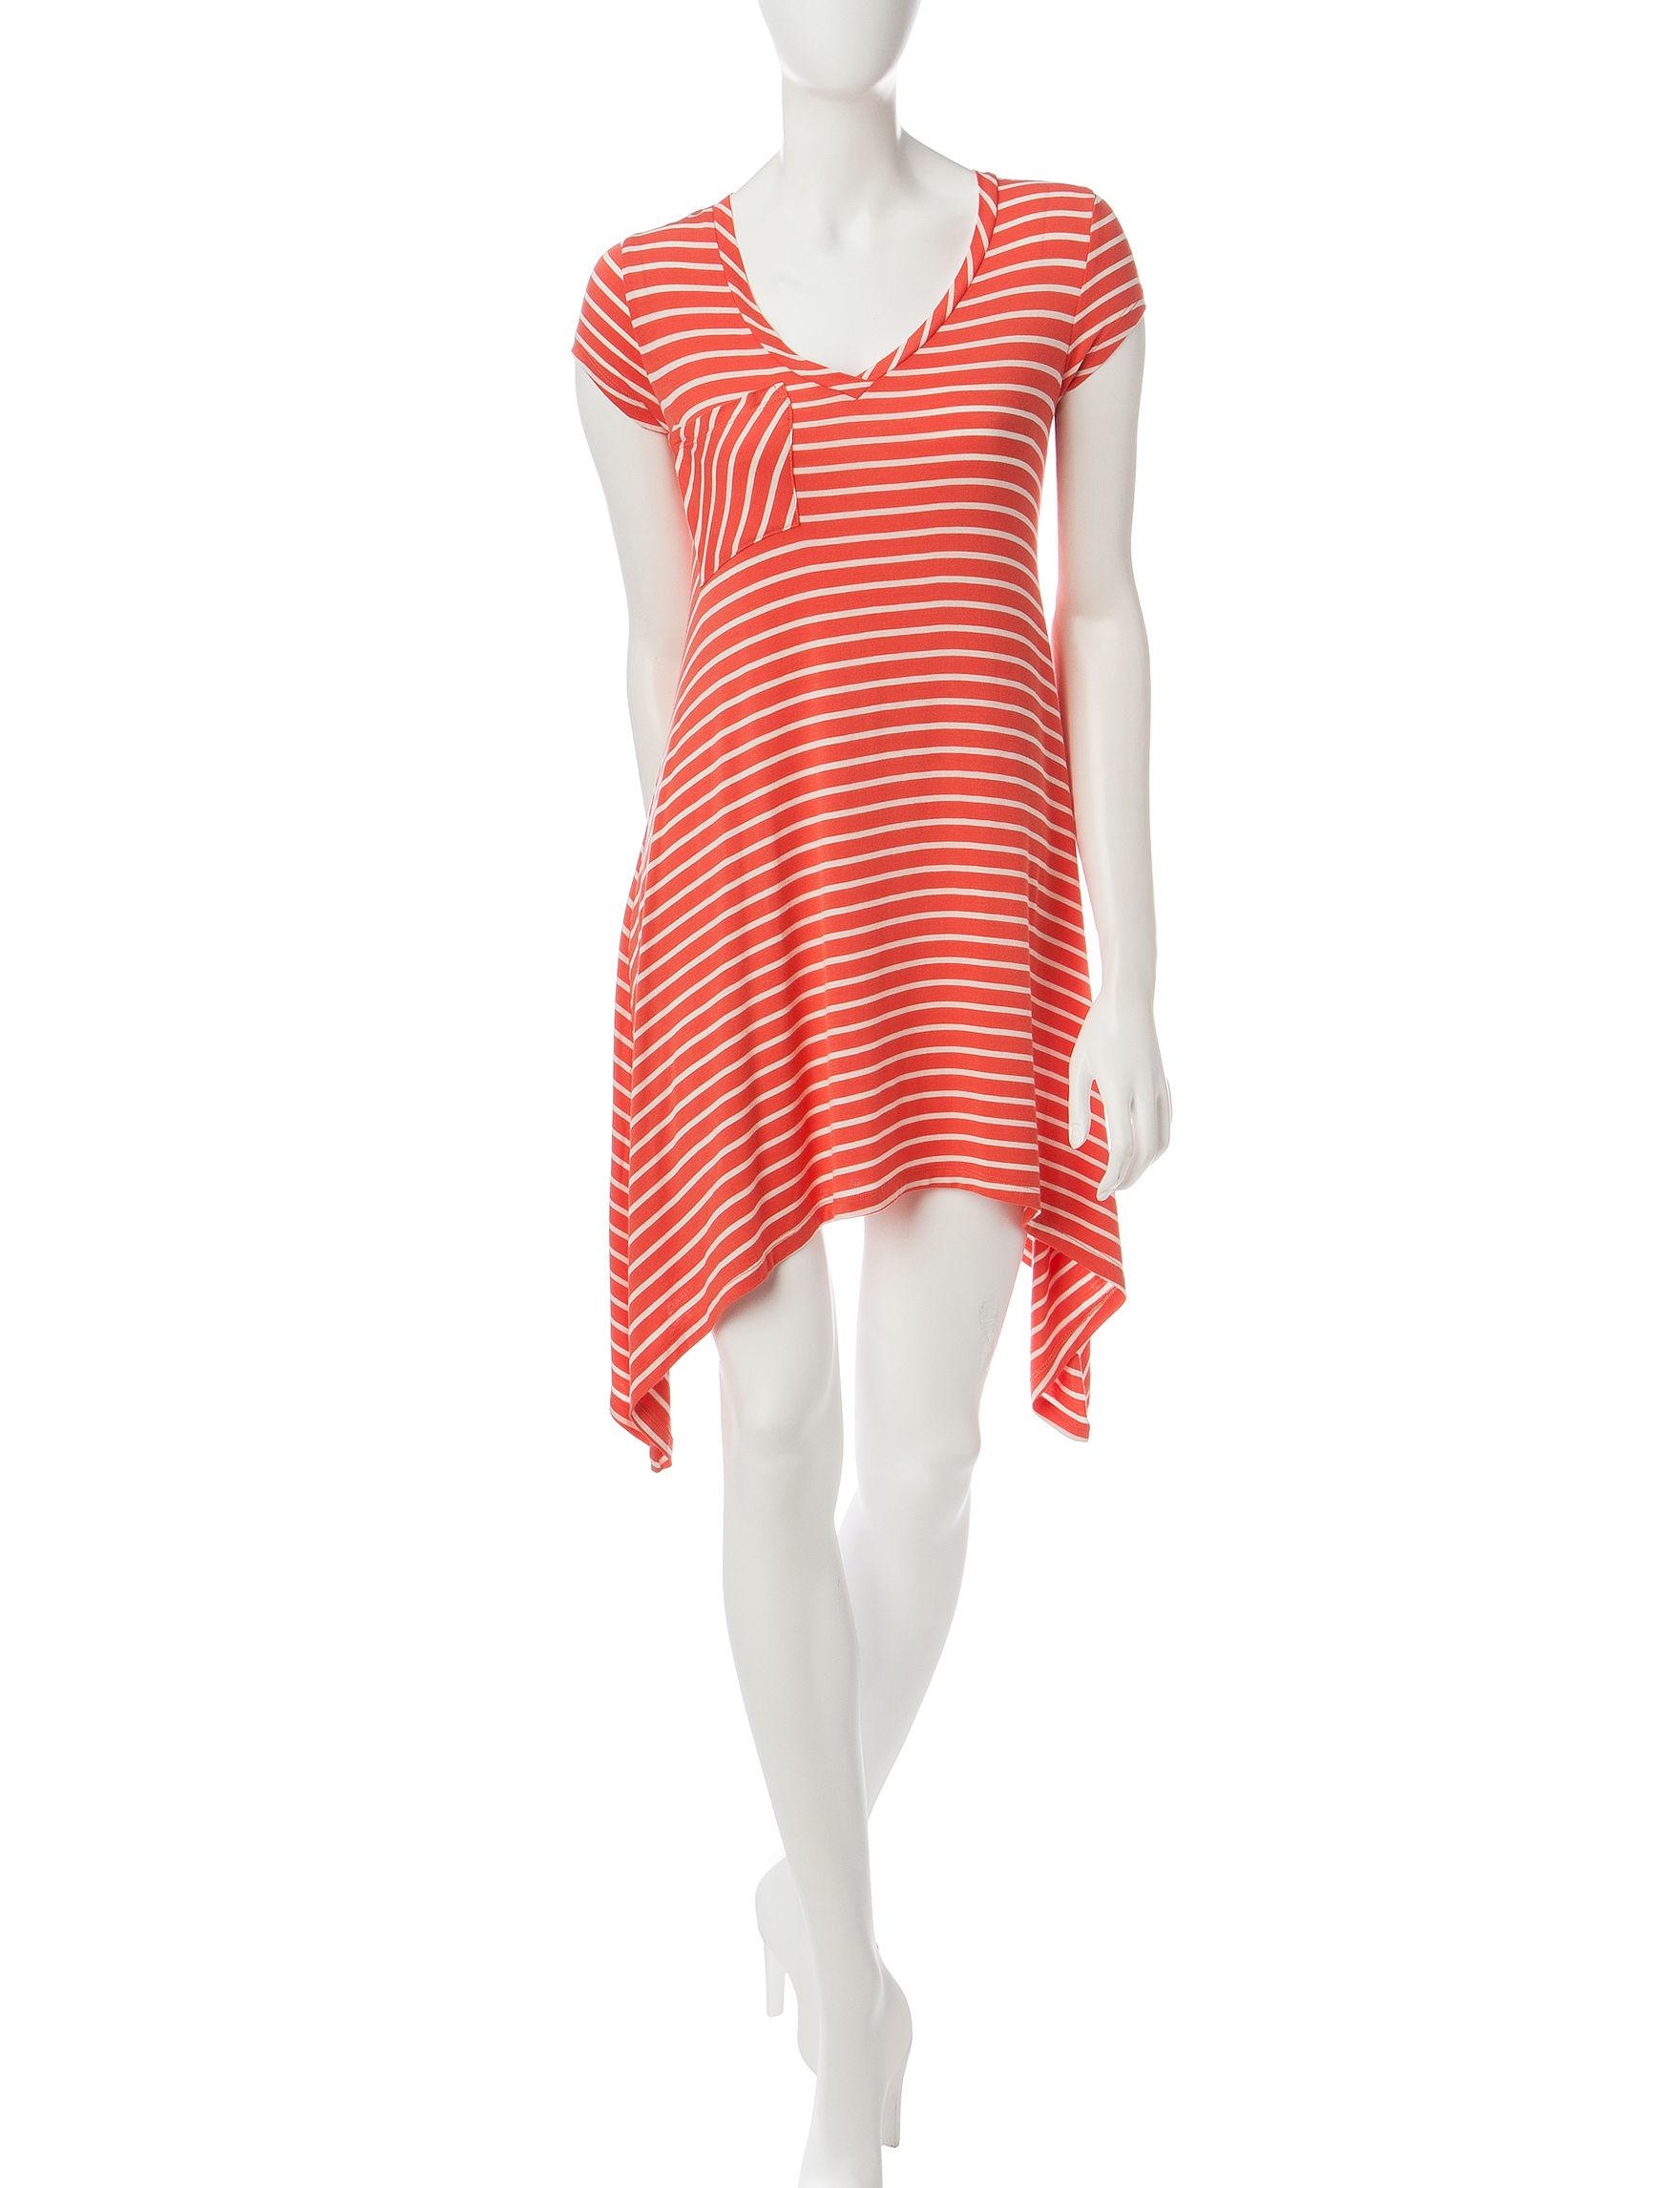 Ultra Flirt Coral Fit & Flare Dresses